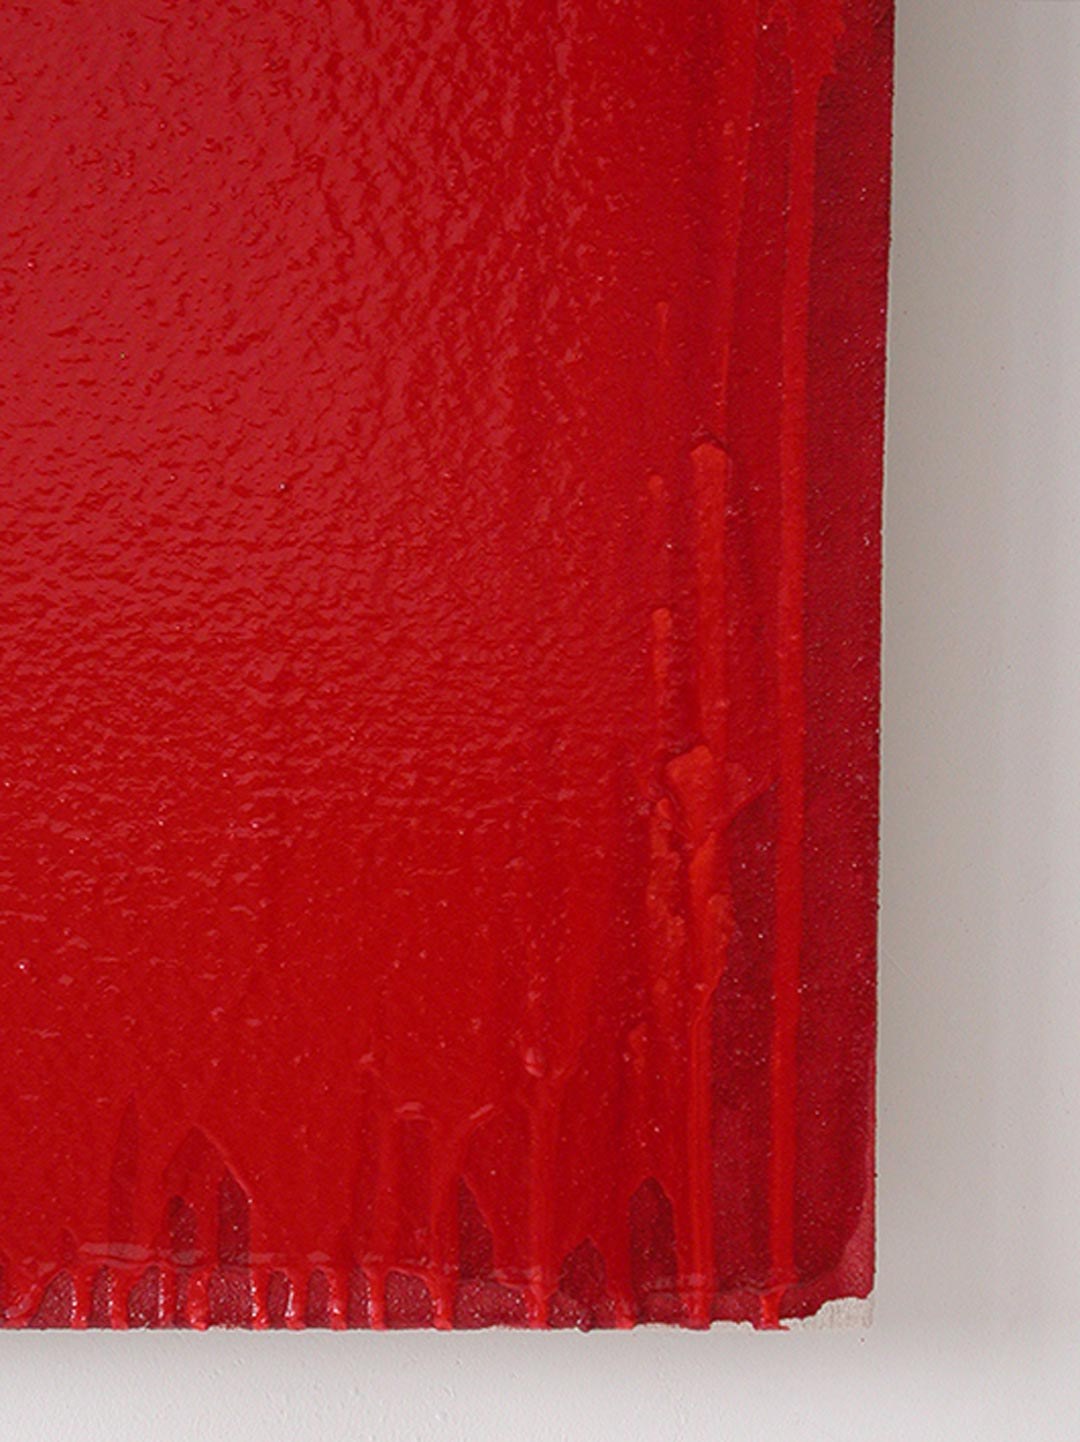 Joseph Marioni, Red Painting (Detail), 2006. Von der Heydt-Museum, Wuppertal © Joseph Marioni